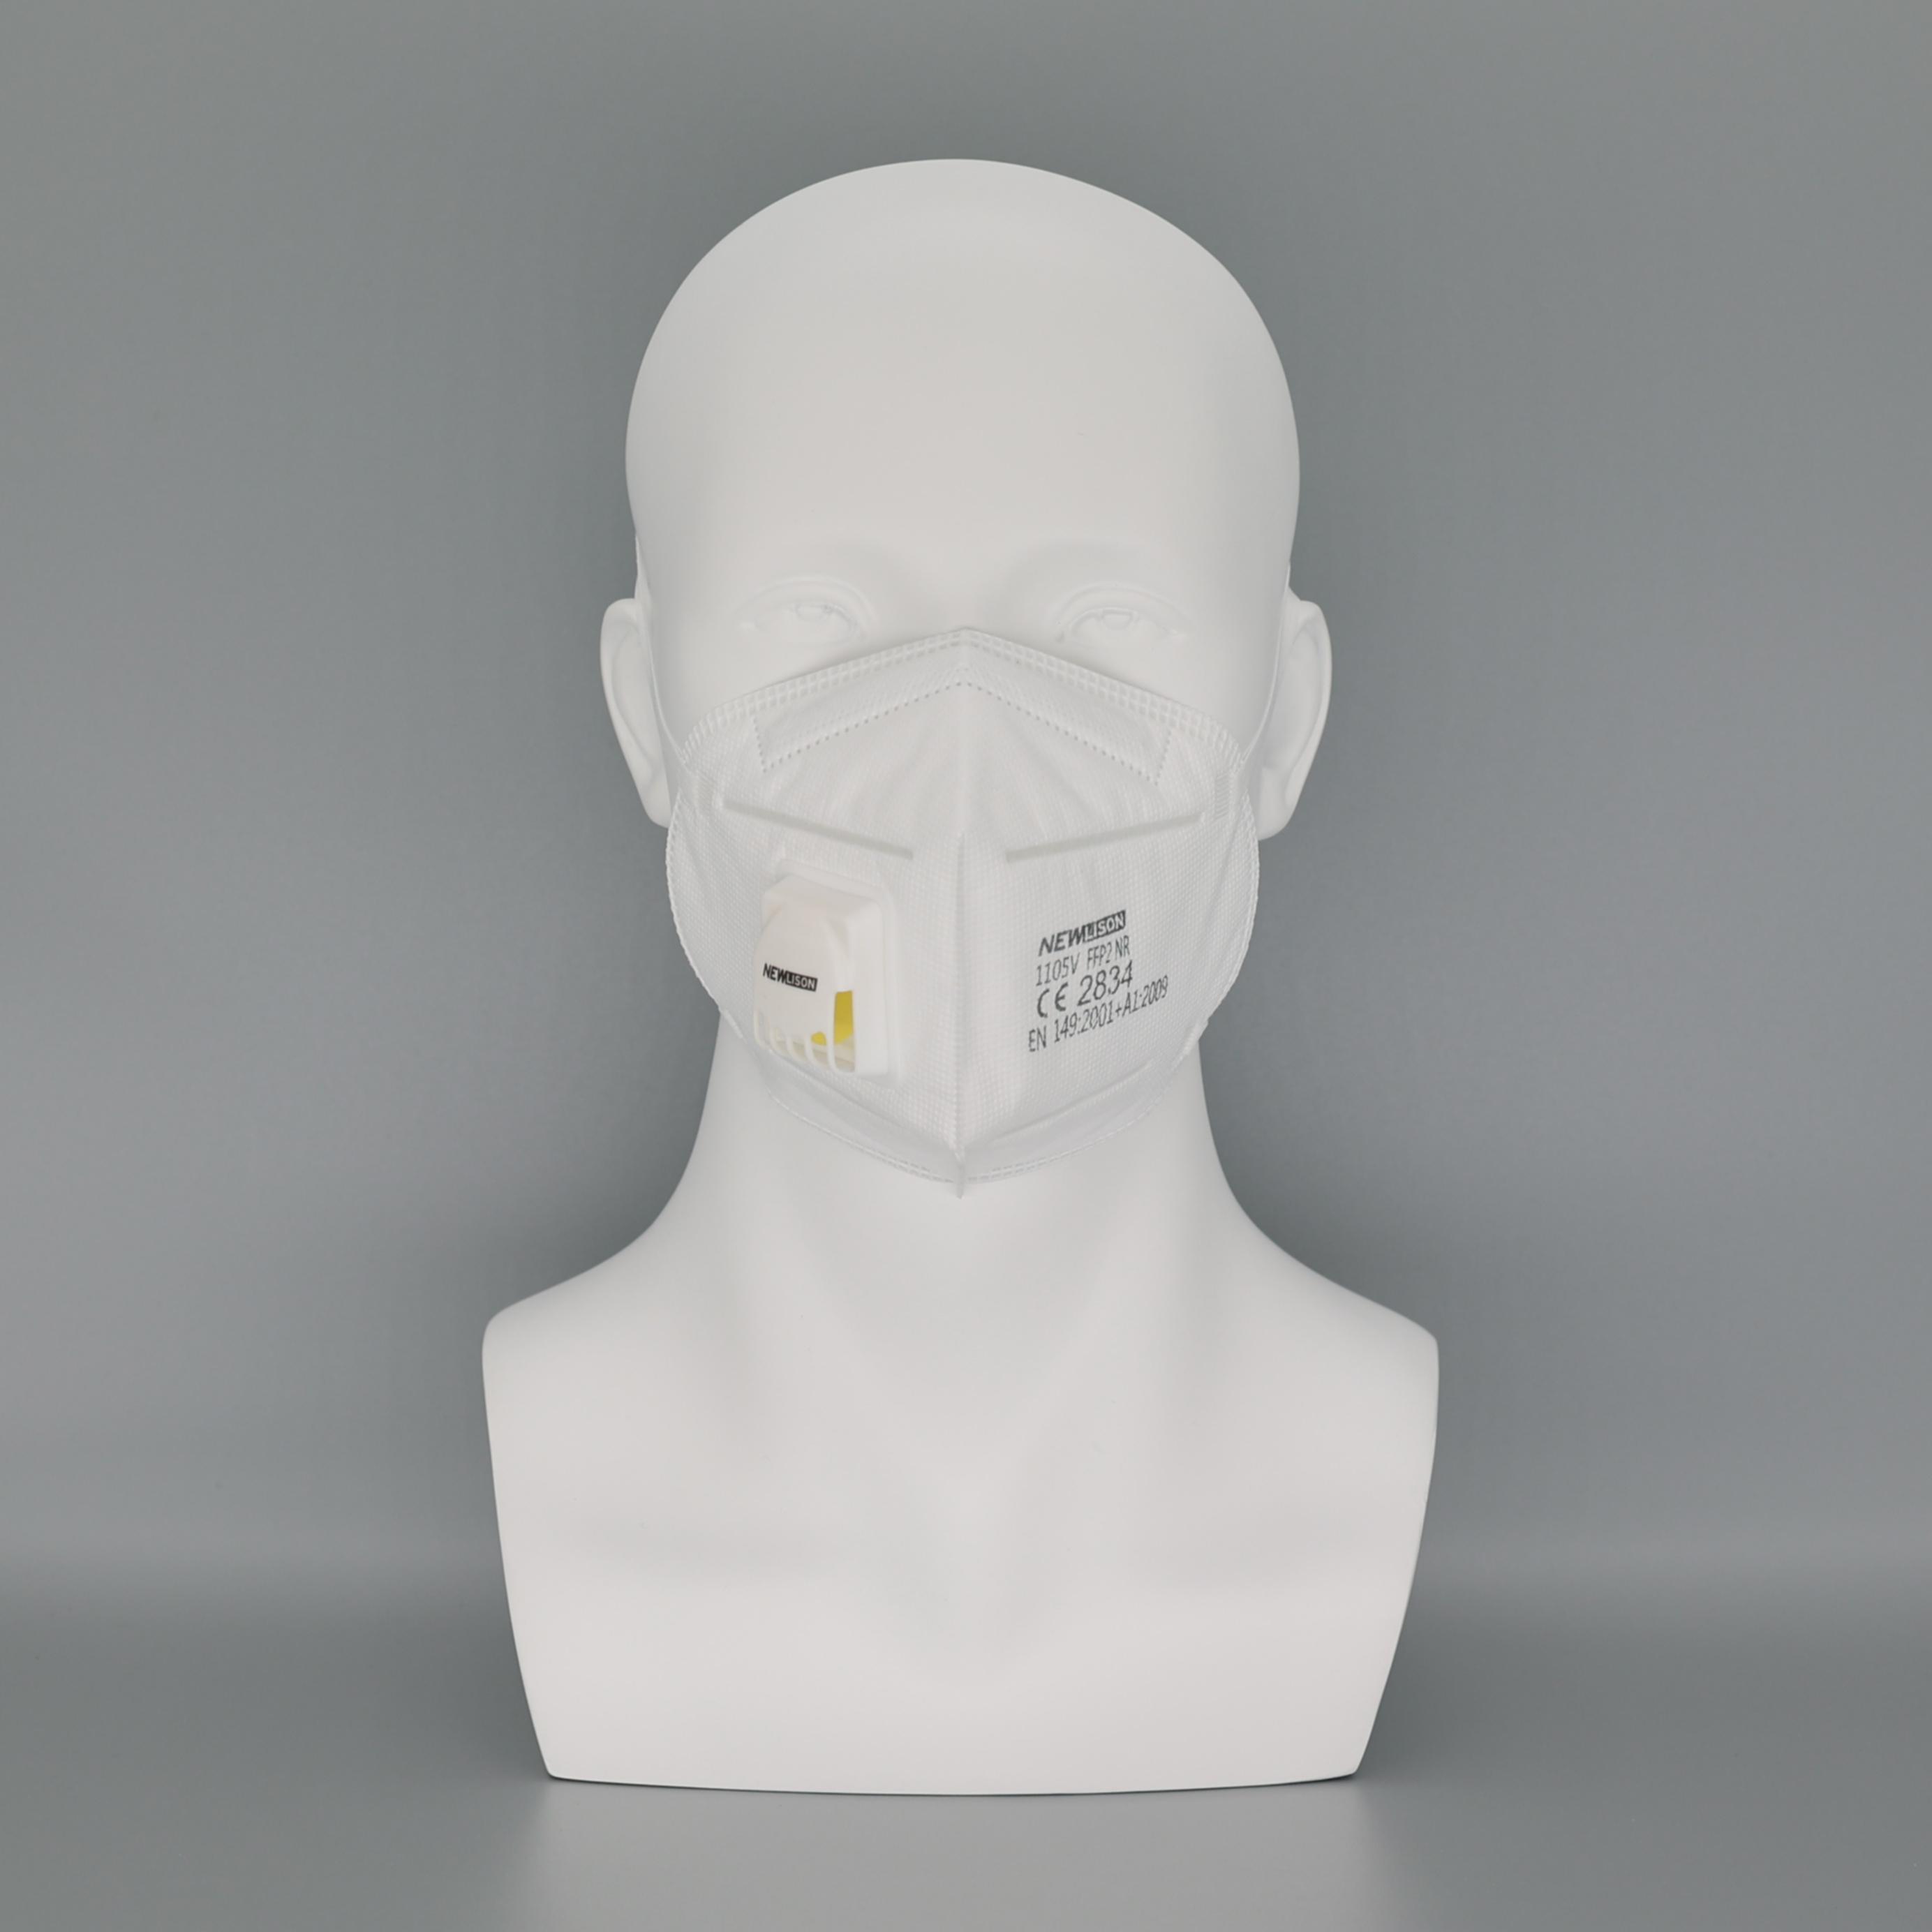 1105V FFP2 NR CE Certificated Newlison Valve PPE White List Disposable Face Mask Mascarilla Reusables Facemask - KingCare | KingCare.net